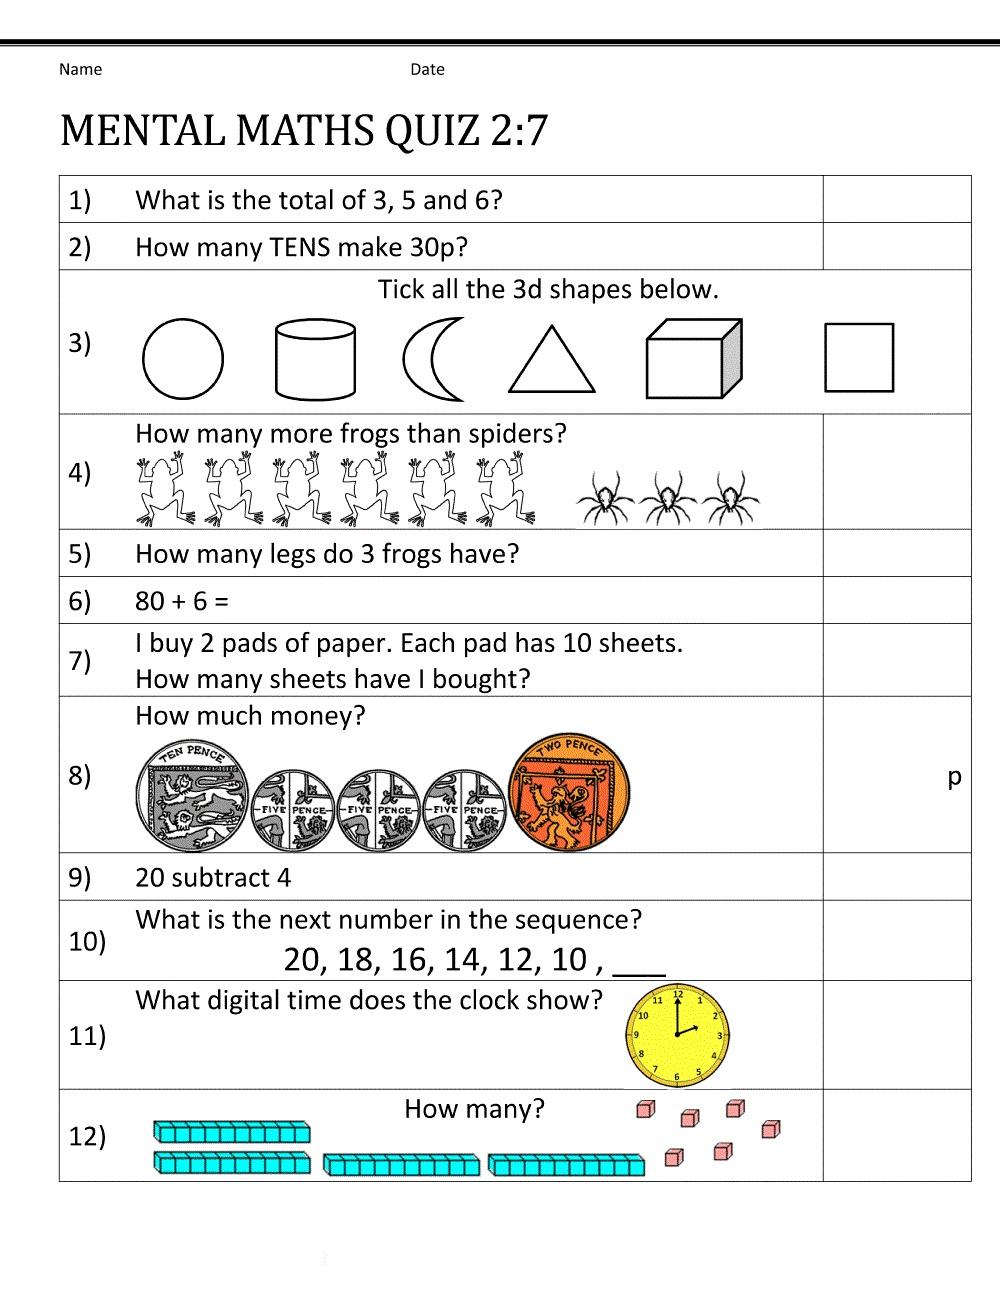 Free Worksheets 200000 For Prek 6Th 123 Homeschool 4 - Free Printable Worksheets For 3 Year Olds